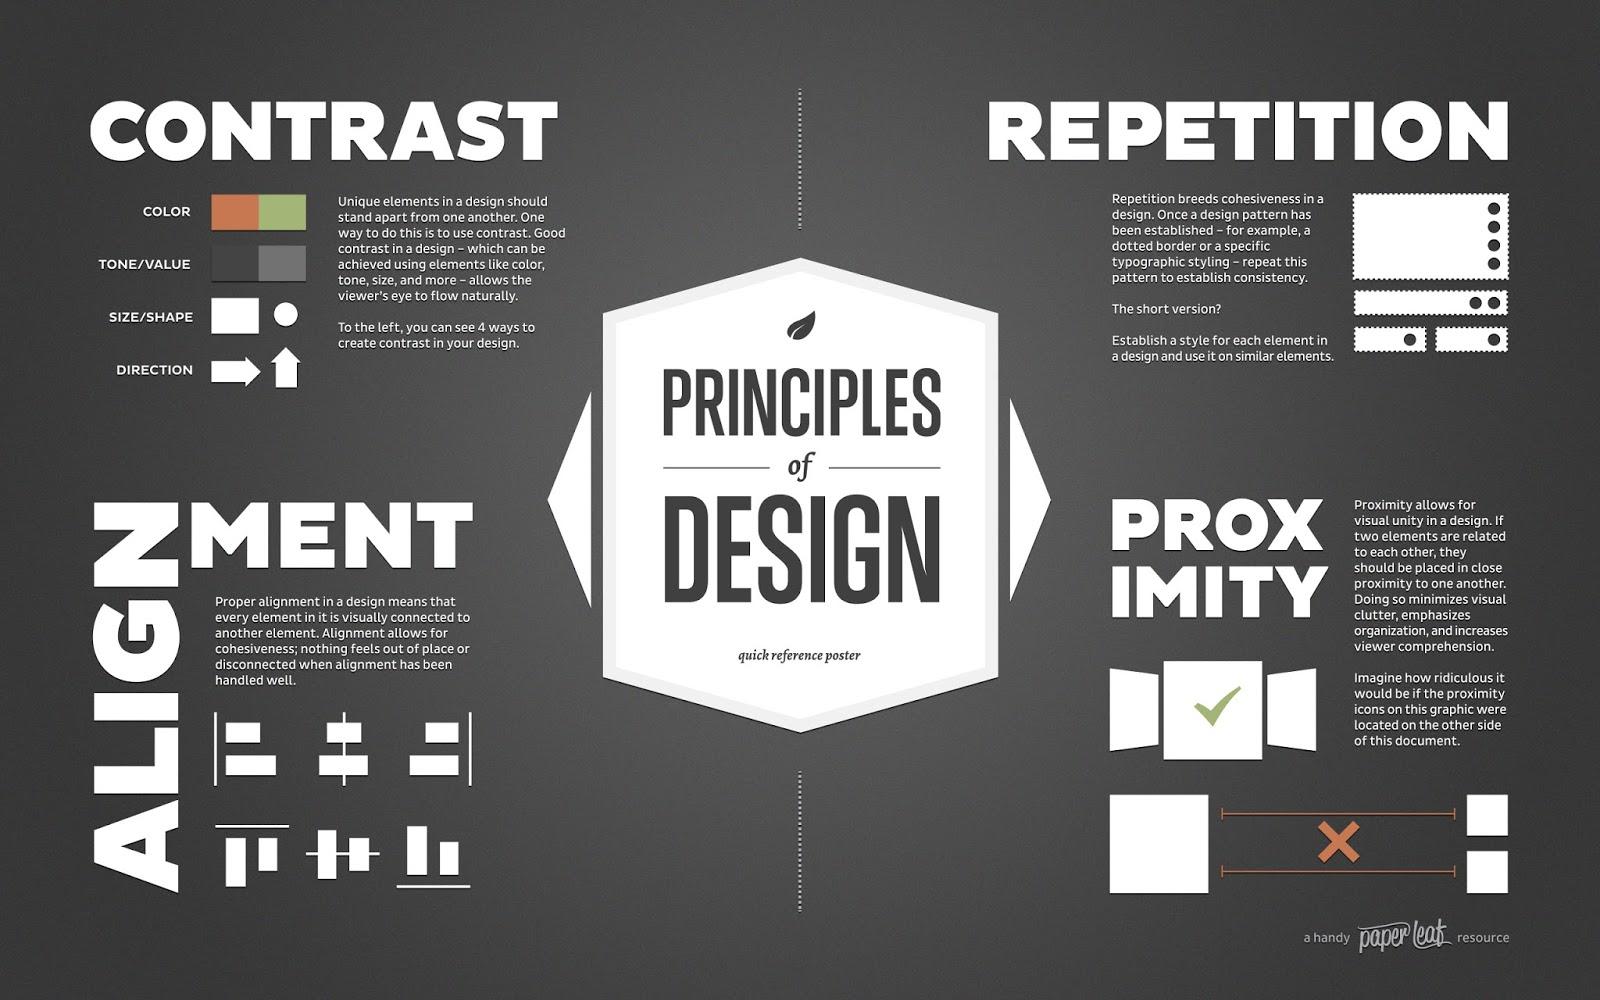 5 principles of design  5 Principles of Design to Make Your Designs Protrude | Art, Design ...